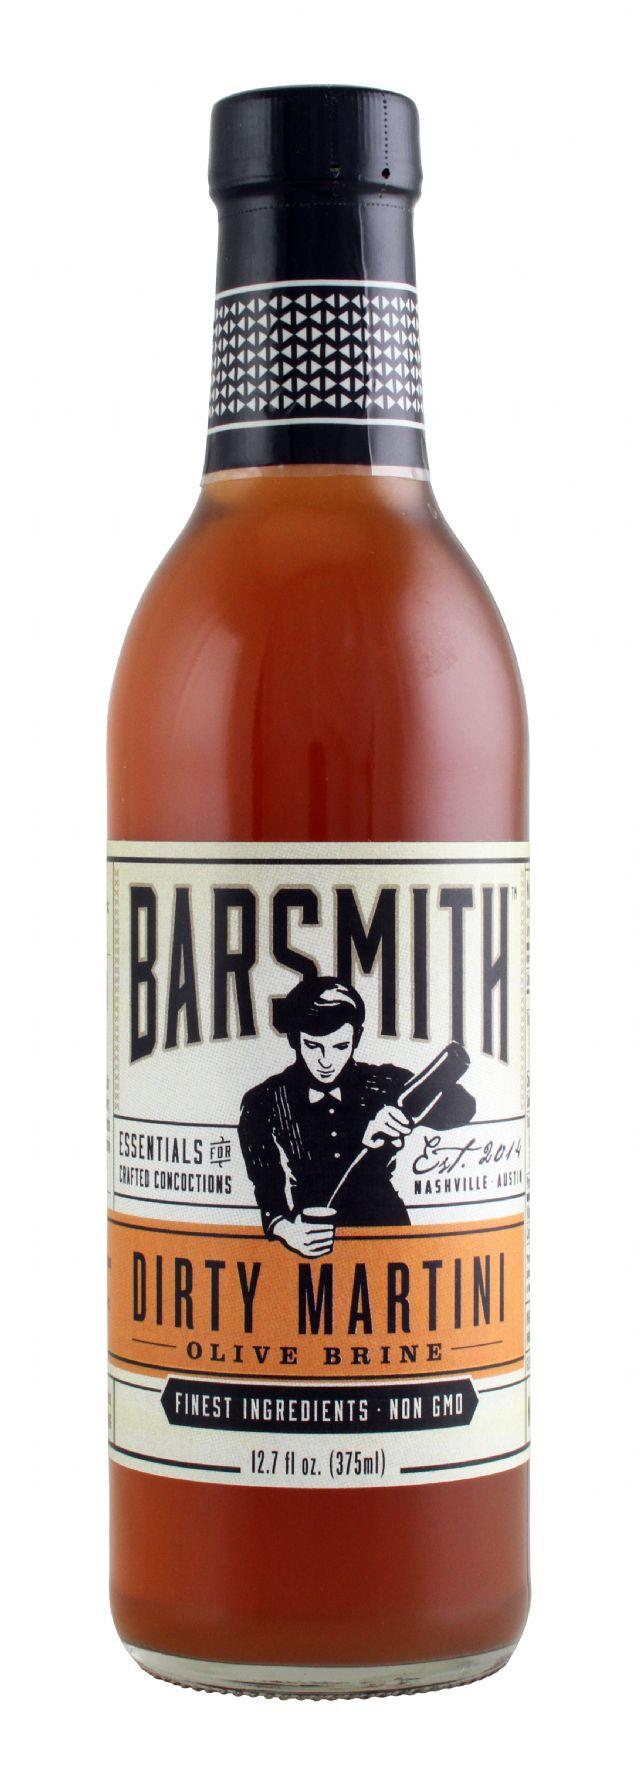 Barsmith: BarSmith DirtyMart Front